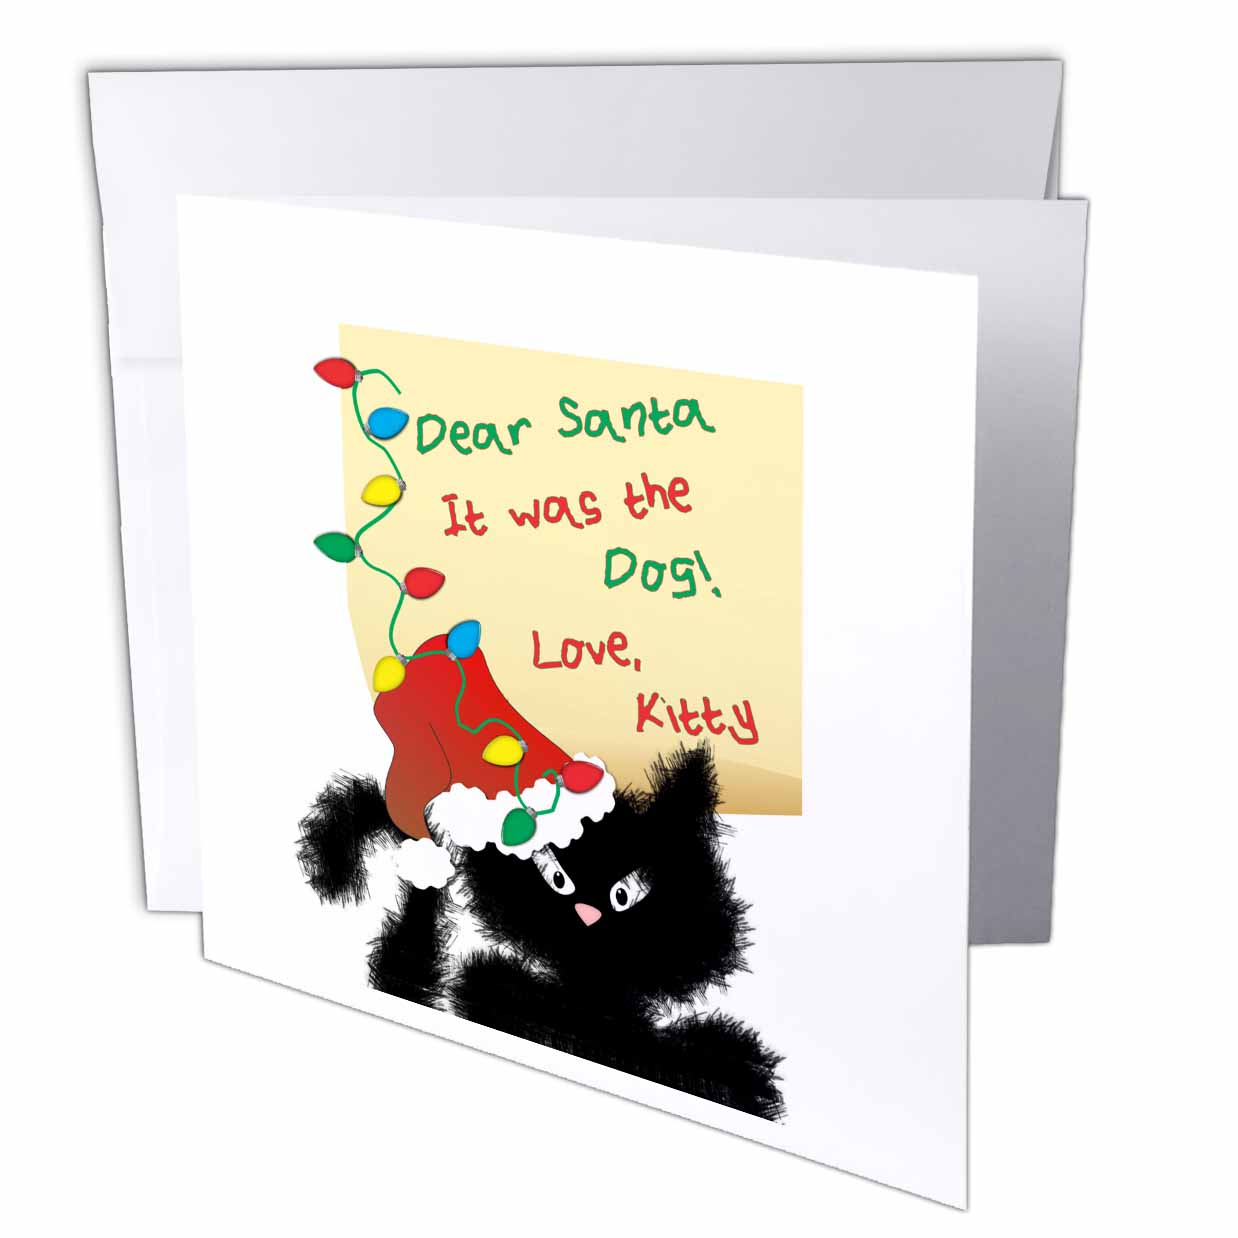 3dRose Funny Fuzzy Black Cat Dear Santa Christmas Letter